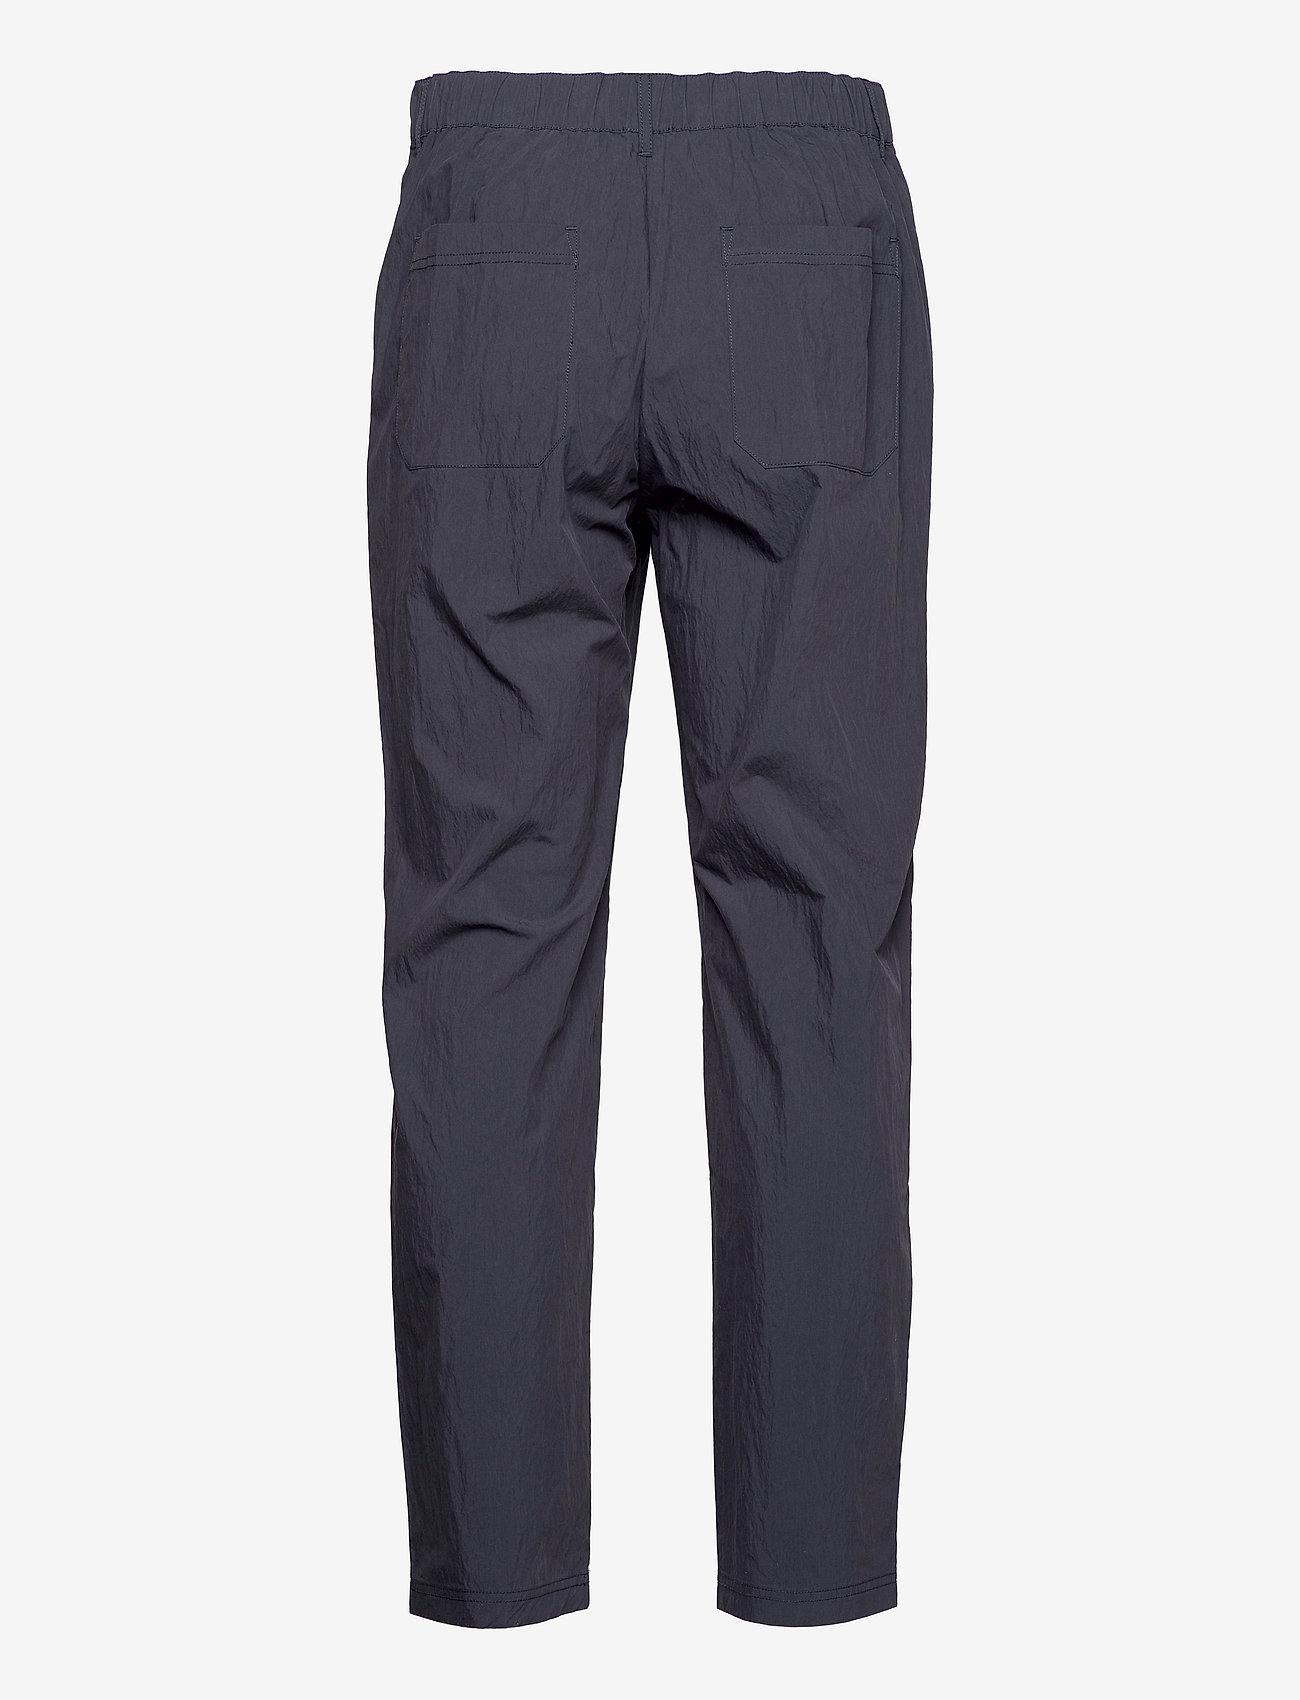 HAN Kjøbenhavn - Tapered Trousers - chino's - dusty navy - 1